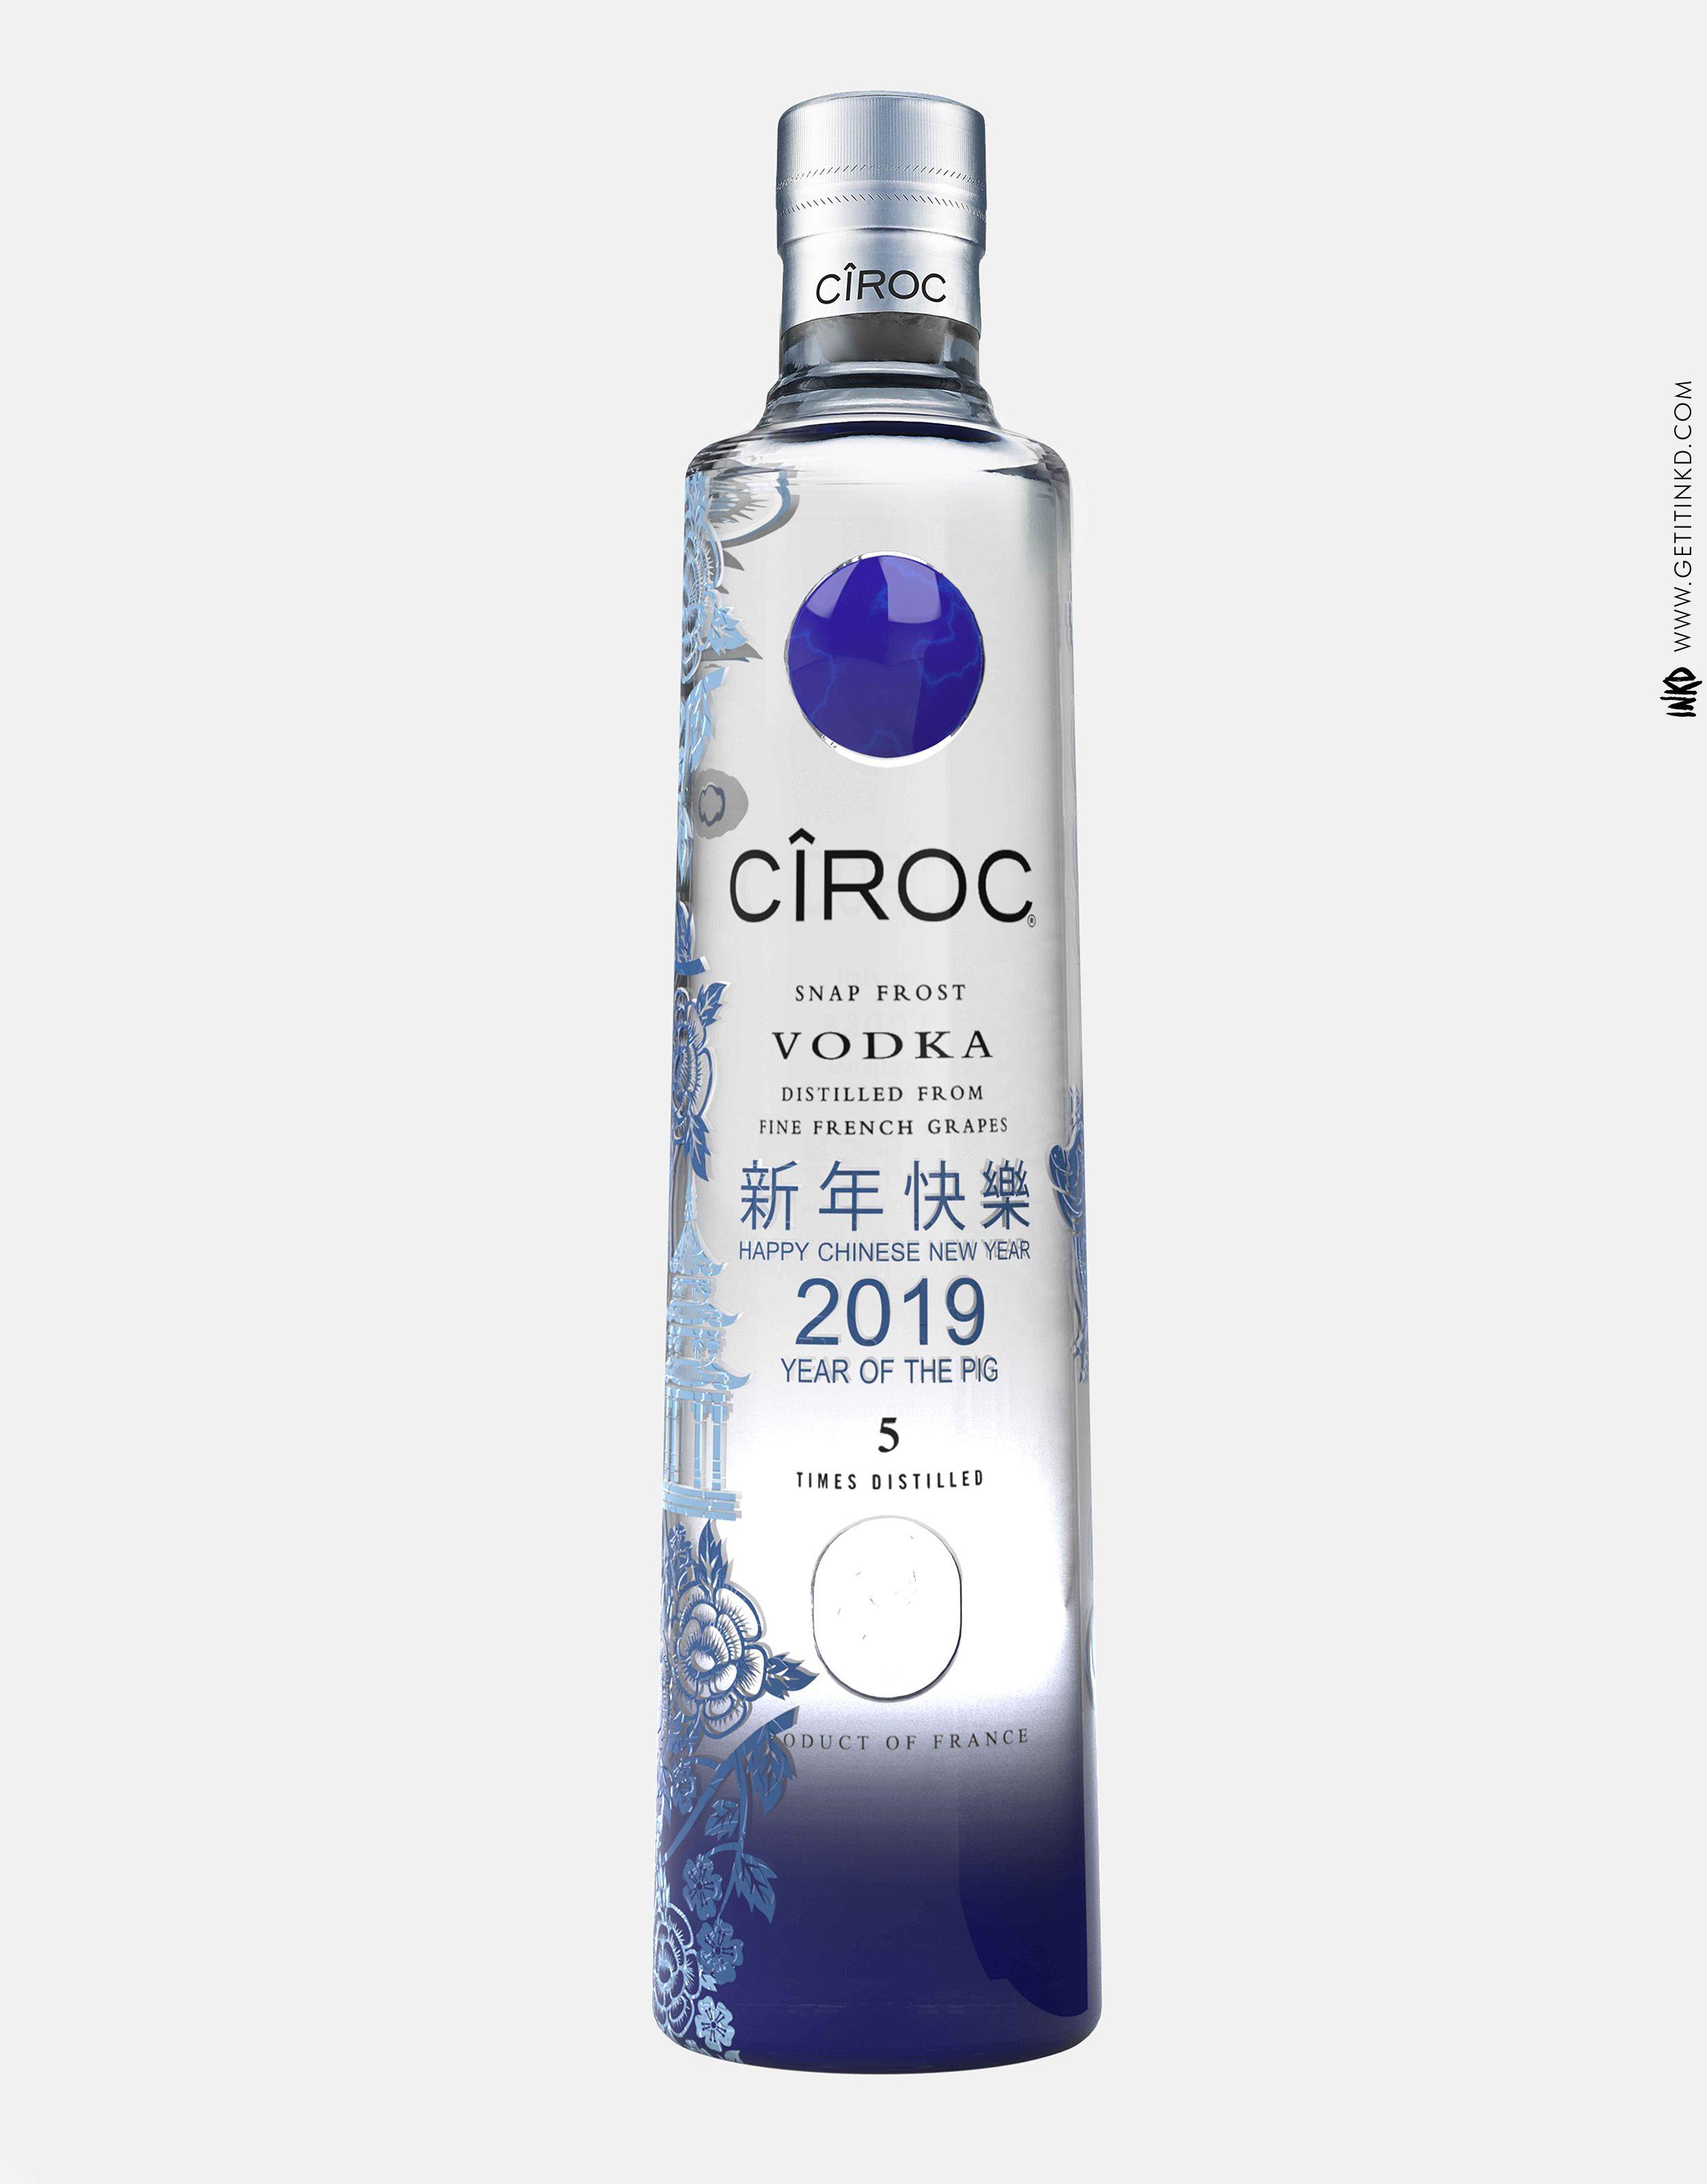 Lightsaberlike technology will etch into the CÎROC bottle